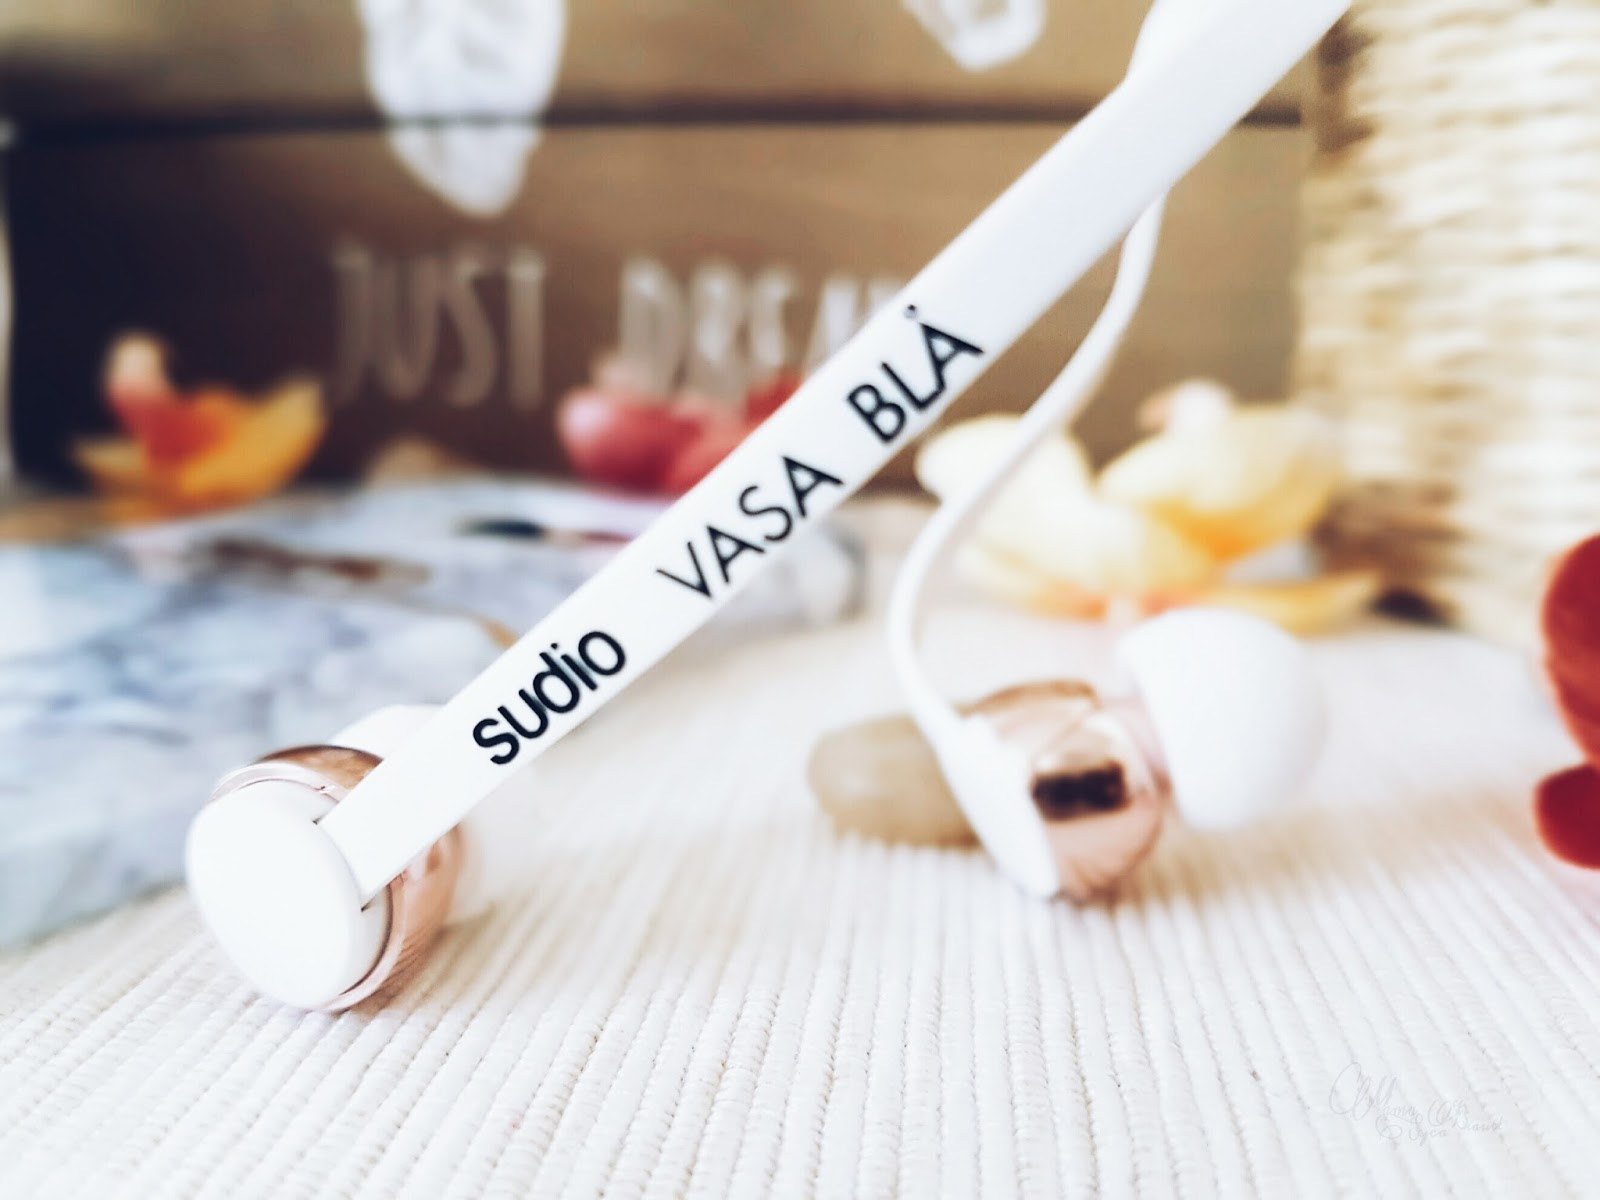 avis_ecouteurs_vasa_bla_sudio_code_promo_mama_syca_beaute